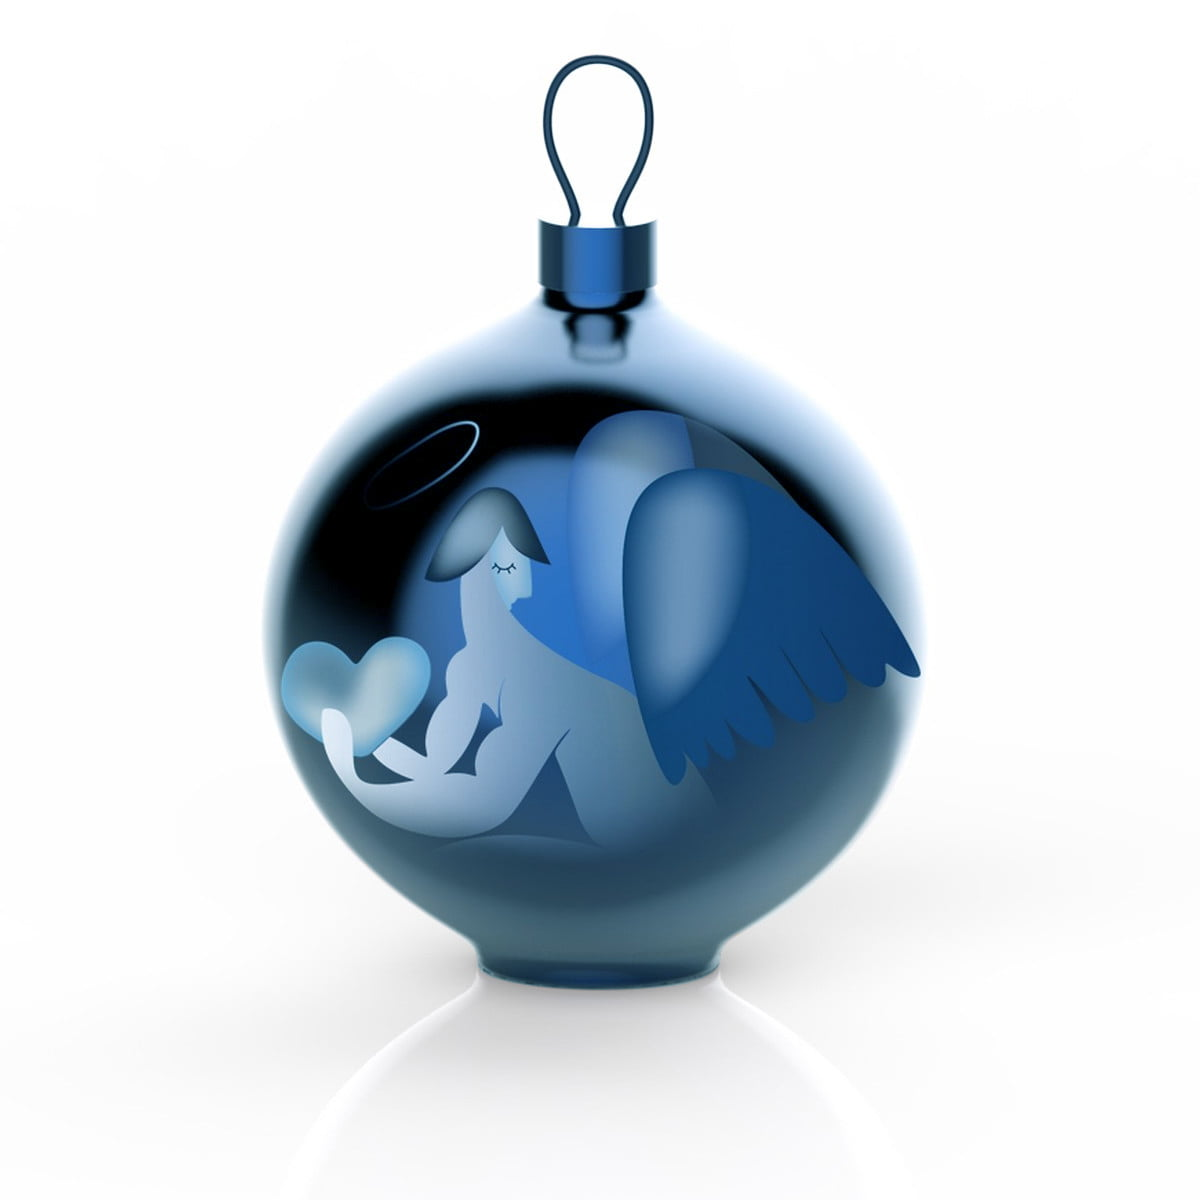 Christbaumkugeln At.Alessi Blue Christmas Christbaumkugeln Engel